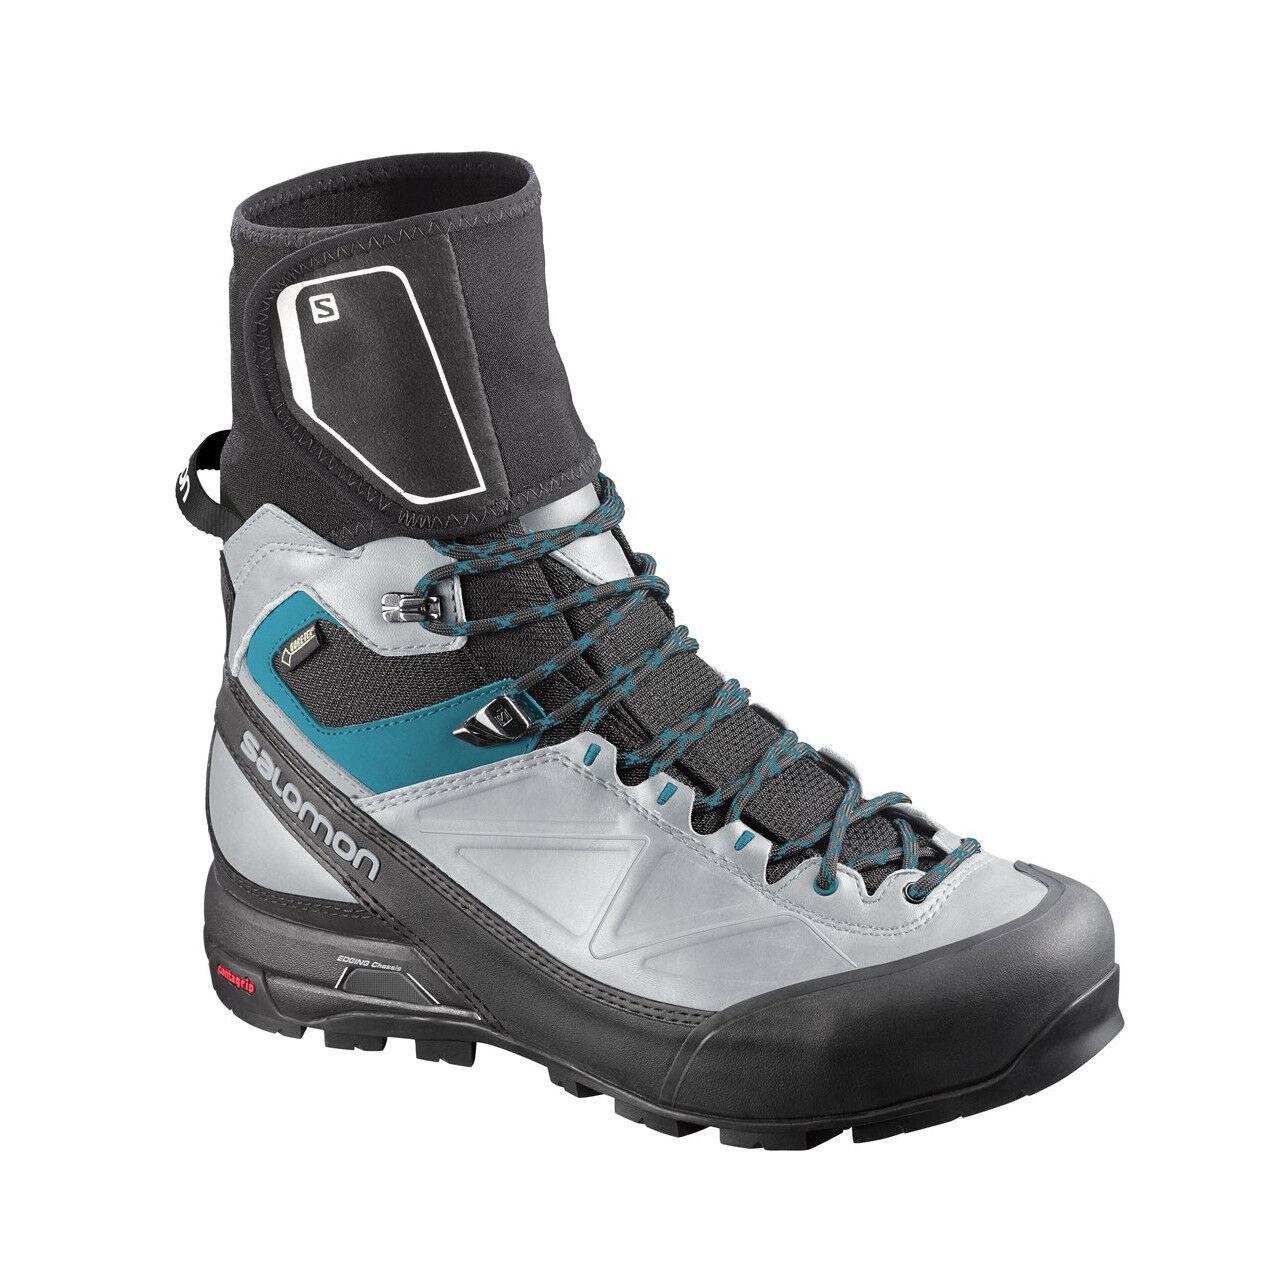 Salomon X Alp PRO GTX W zapatos señora botas outdoor botas gore tex wanderschuh